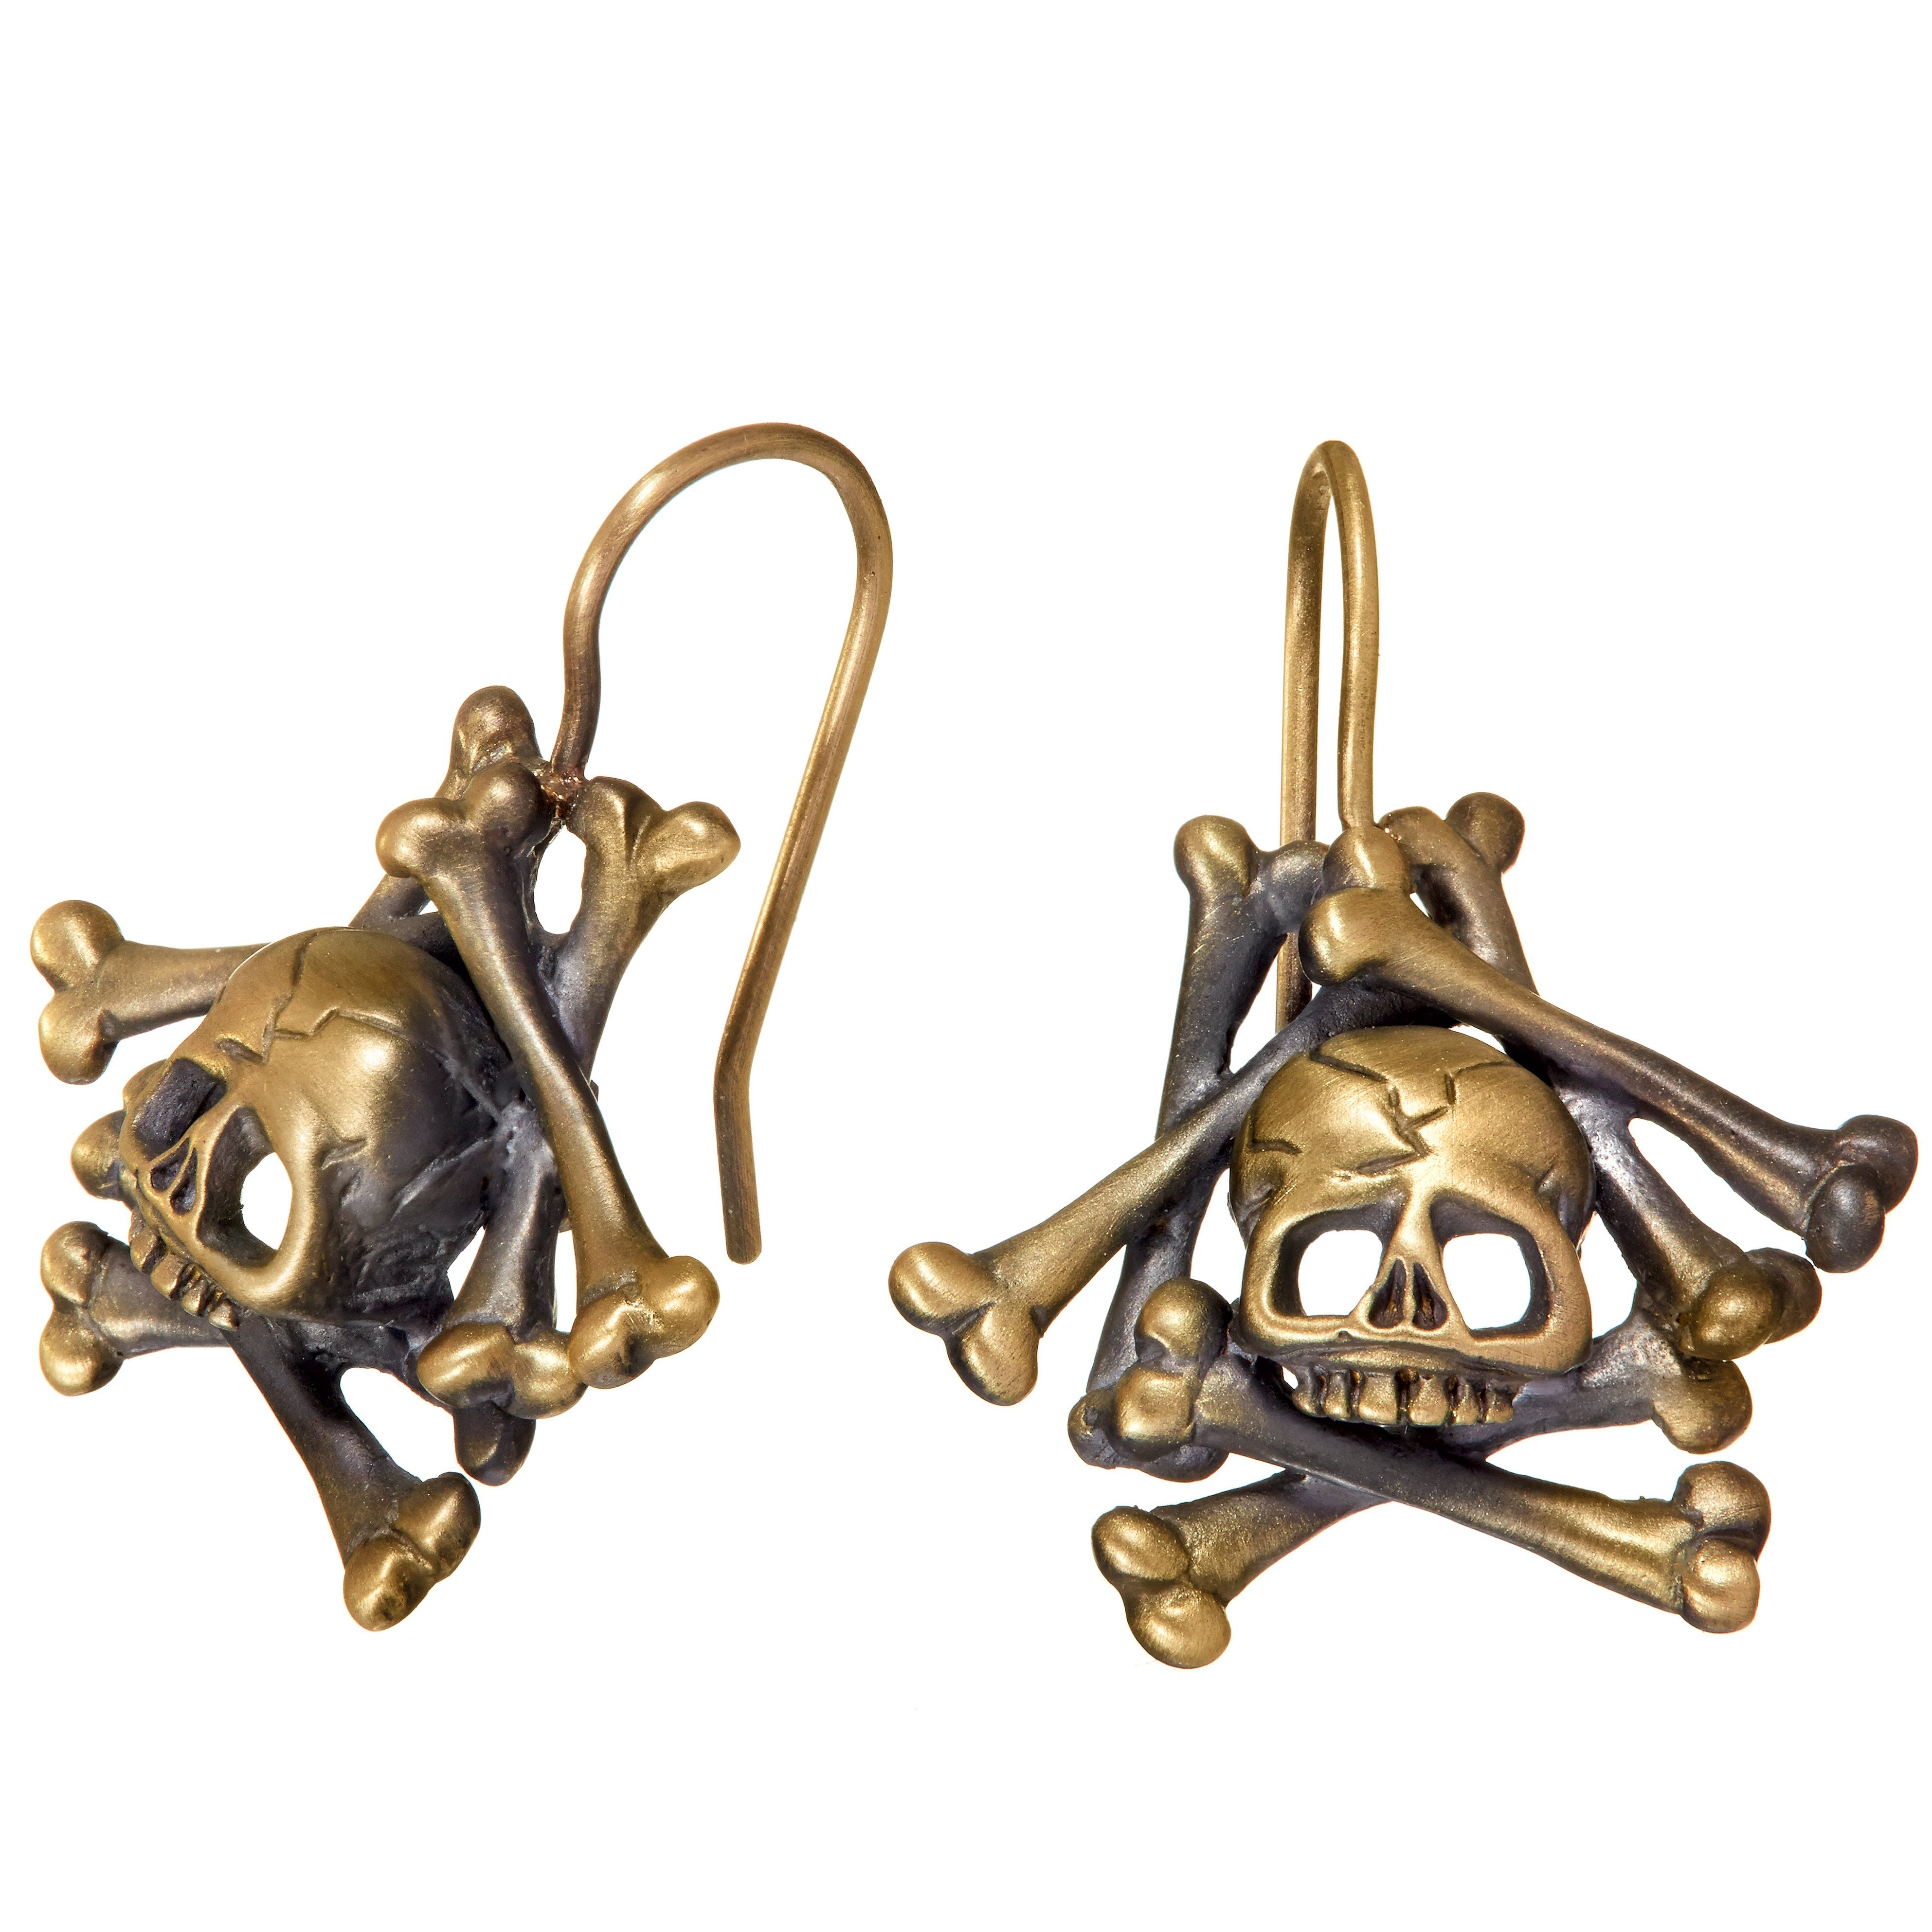 Wendy Brandes Memento Mori Skull and Bones Solid Yellow Gold Drop Earrings